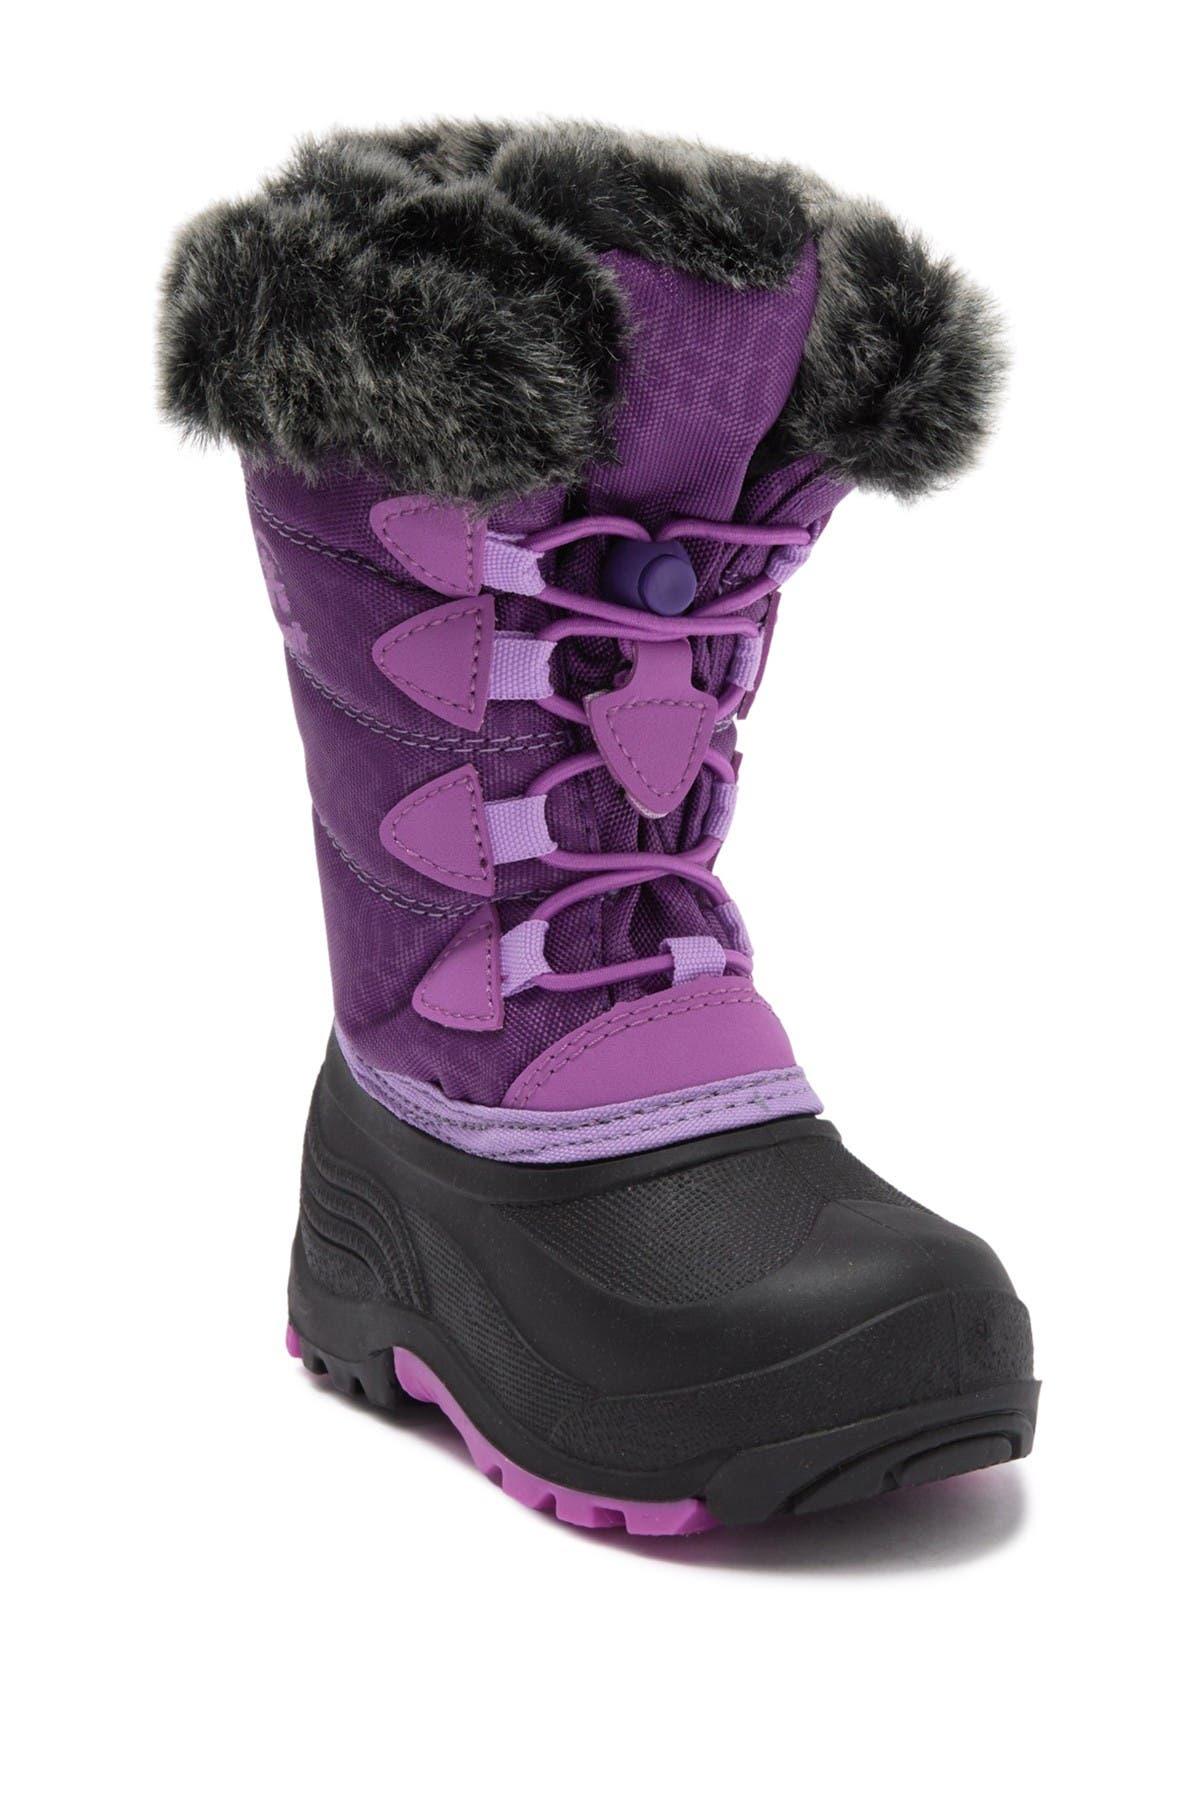 Image of Kamik SnowGypsy3 Waterproof Faux Fur Trim Boot